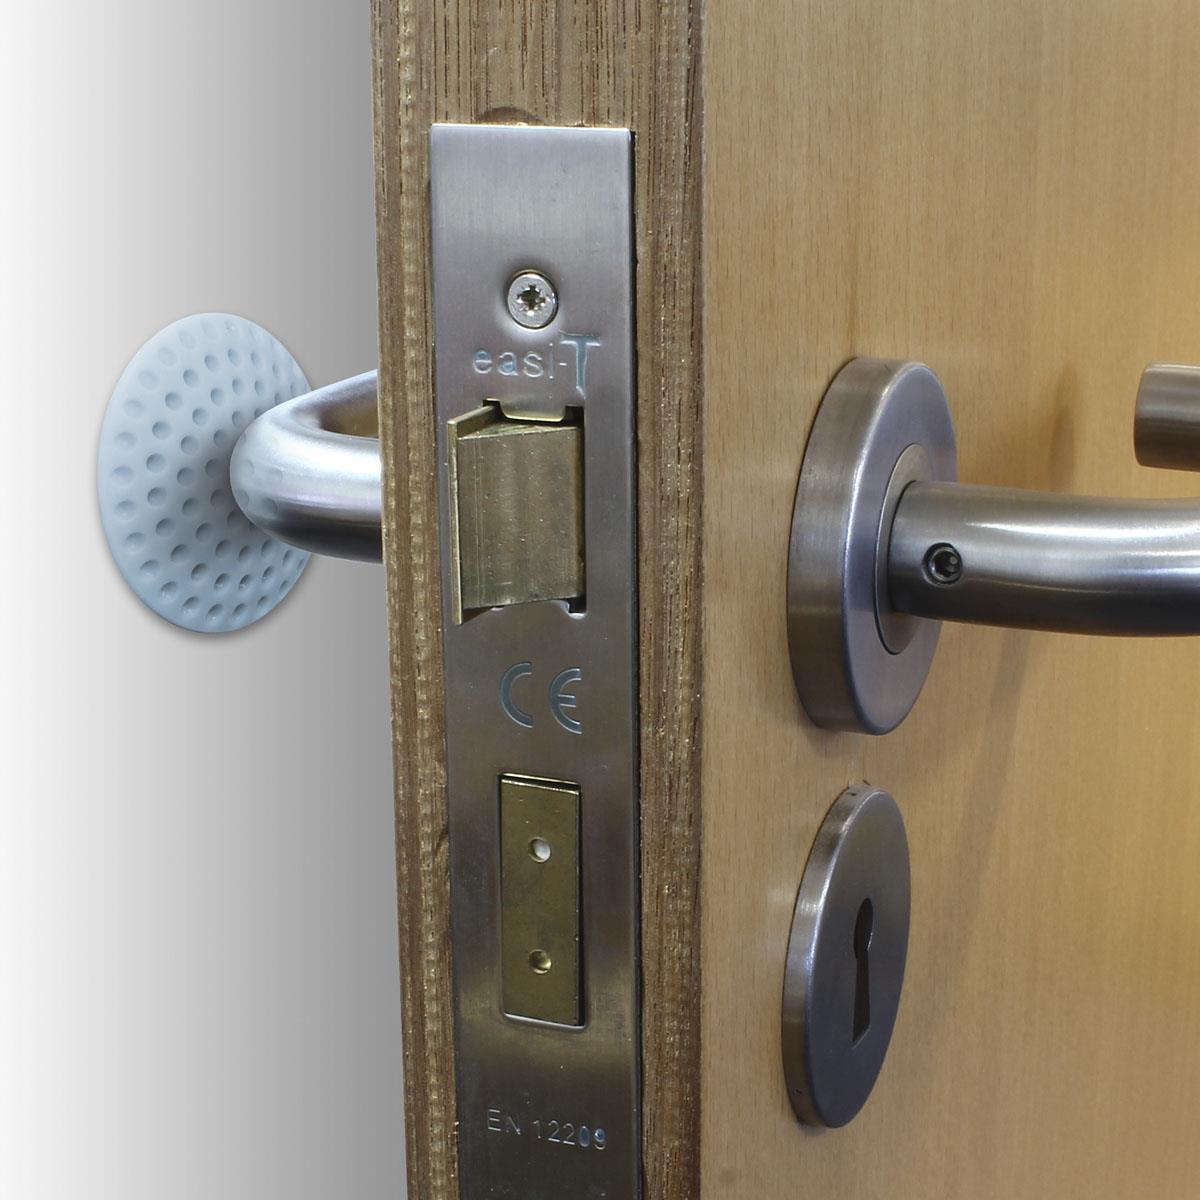 5-x-Wall-Protector-Self-Adhesive-Rubber-Stop-Door-Handle-Bumper-Guard-Stopper miniatuur 6